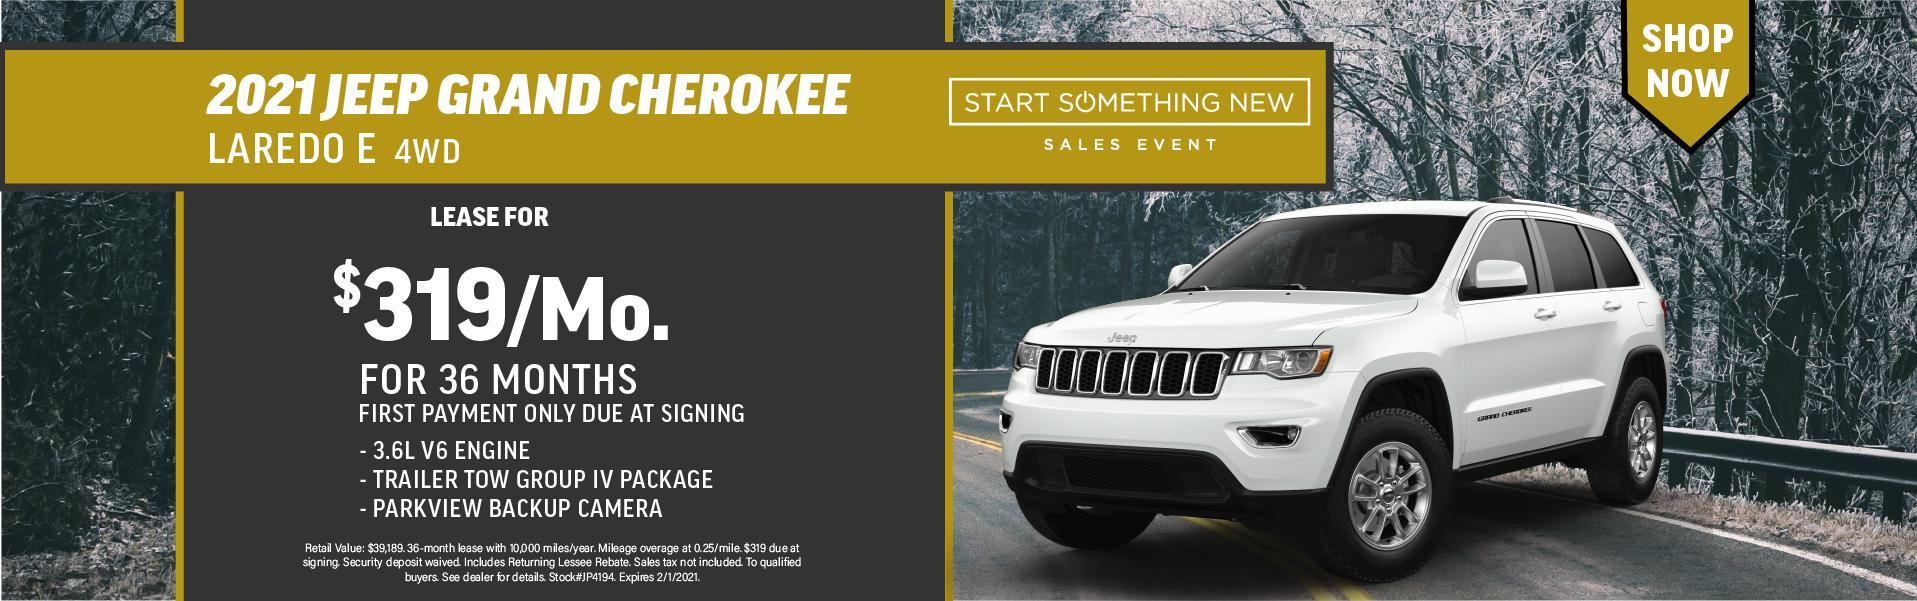 Quirk 2021 Jeep Grand Cherokee- January 2021